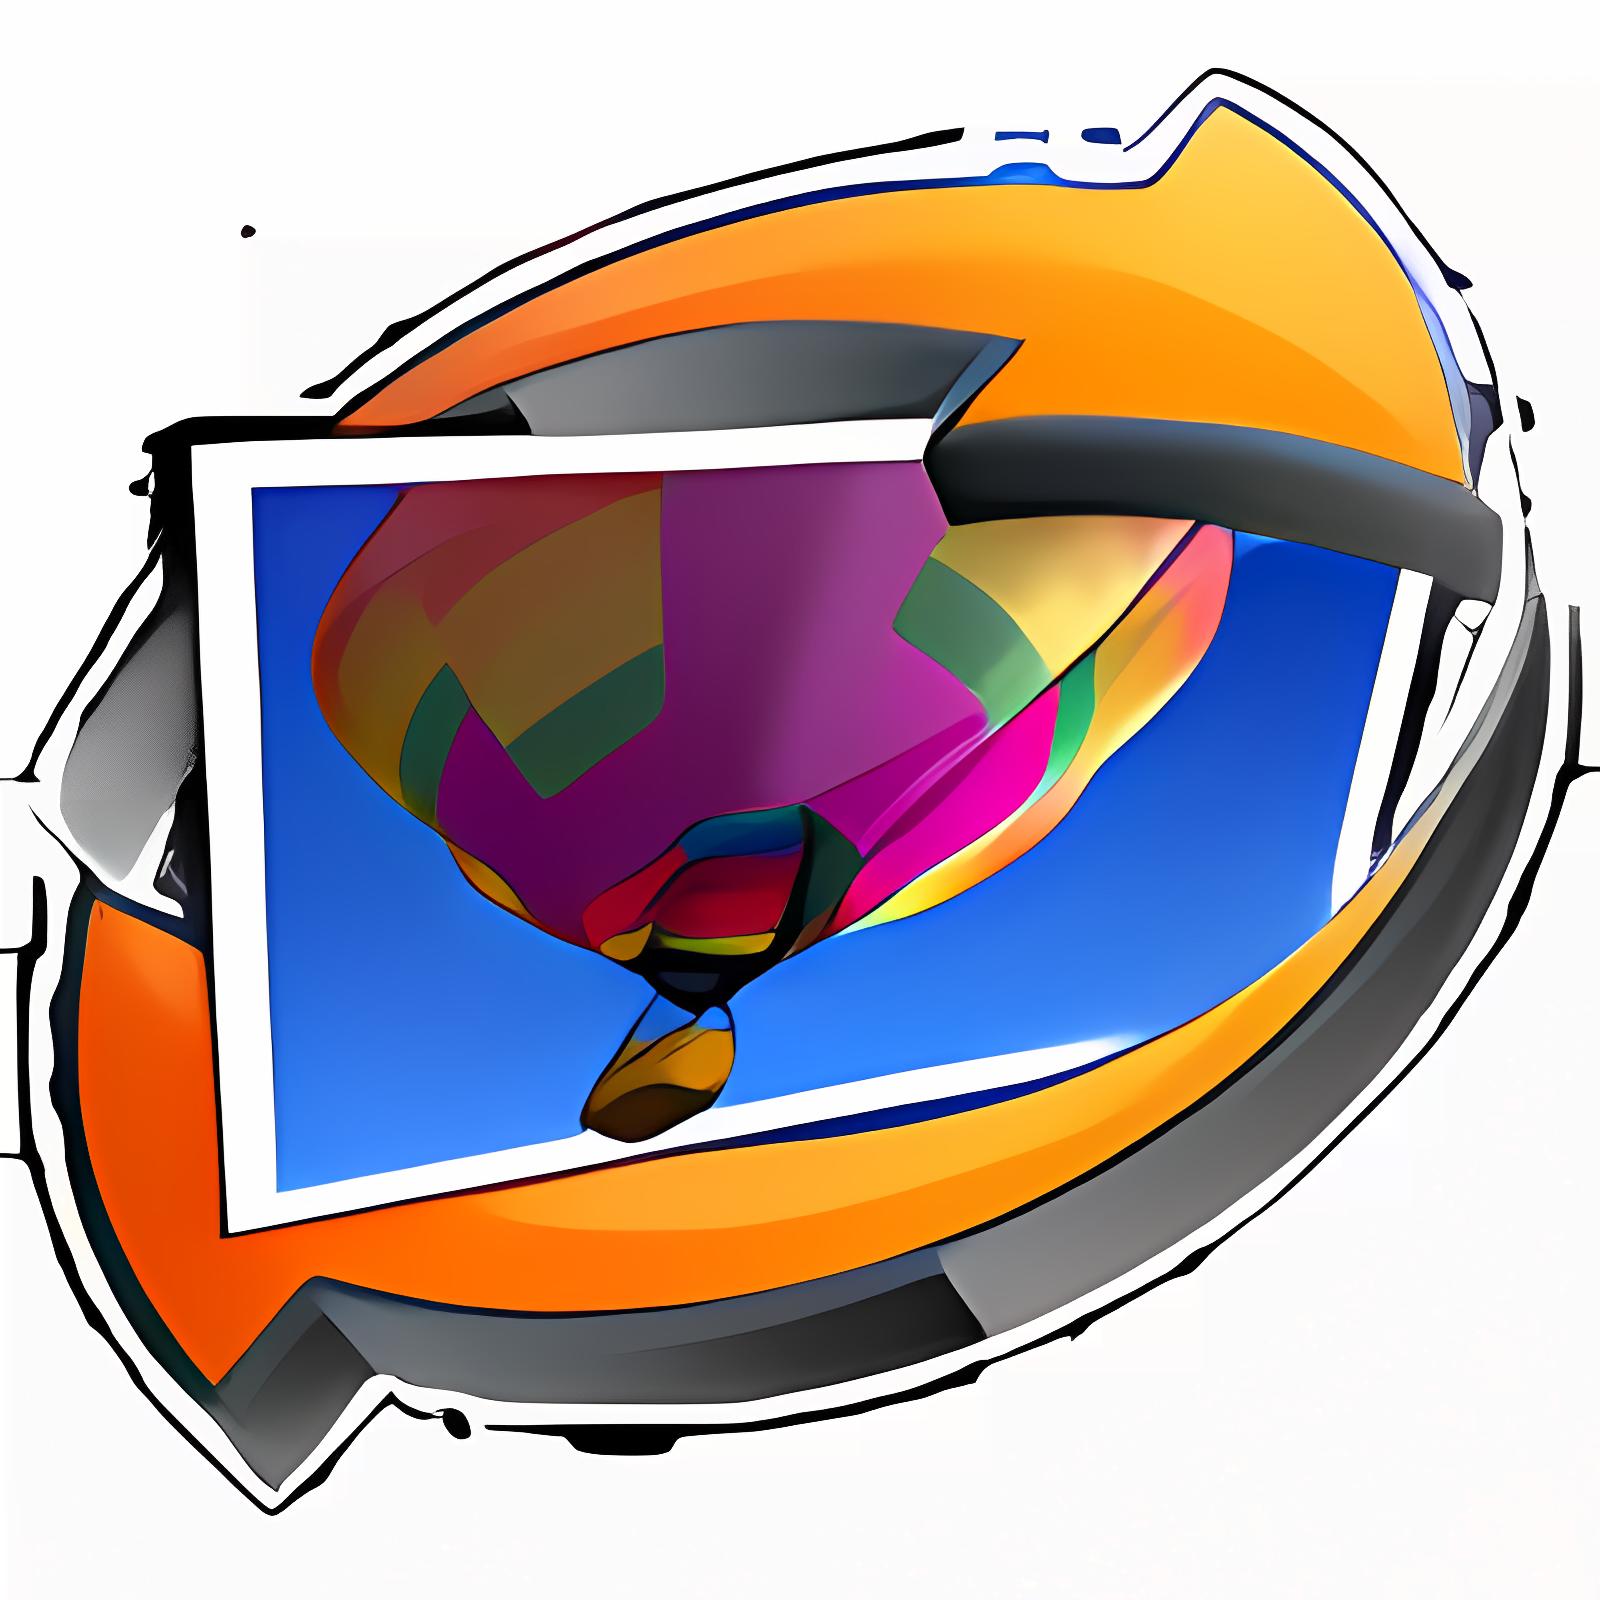 ImageConverterPro